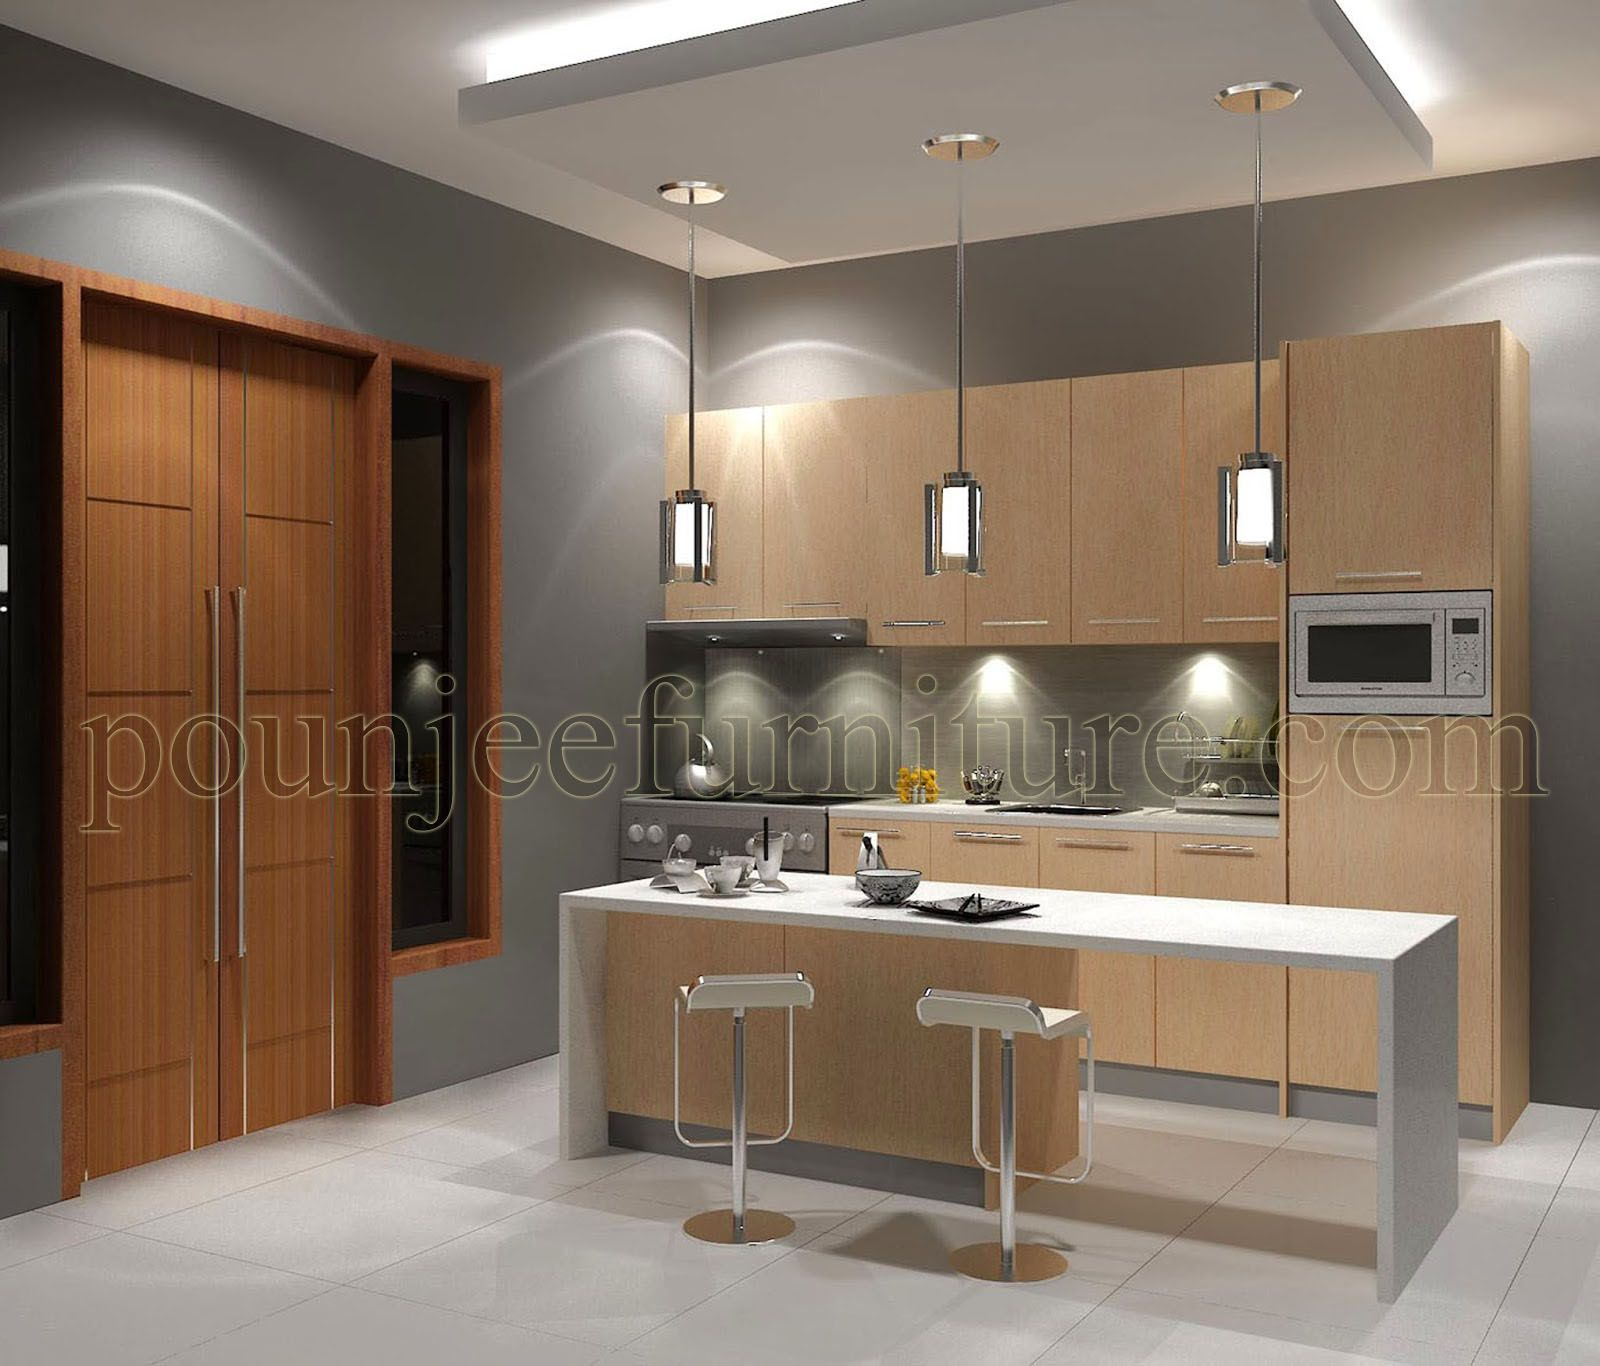 Kitchen Set Minimalis Bahan Hpl Www Pounjeefurniture Com In 2018